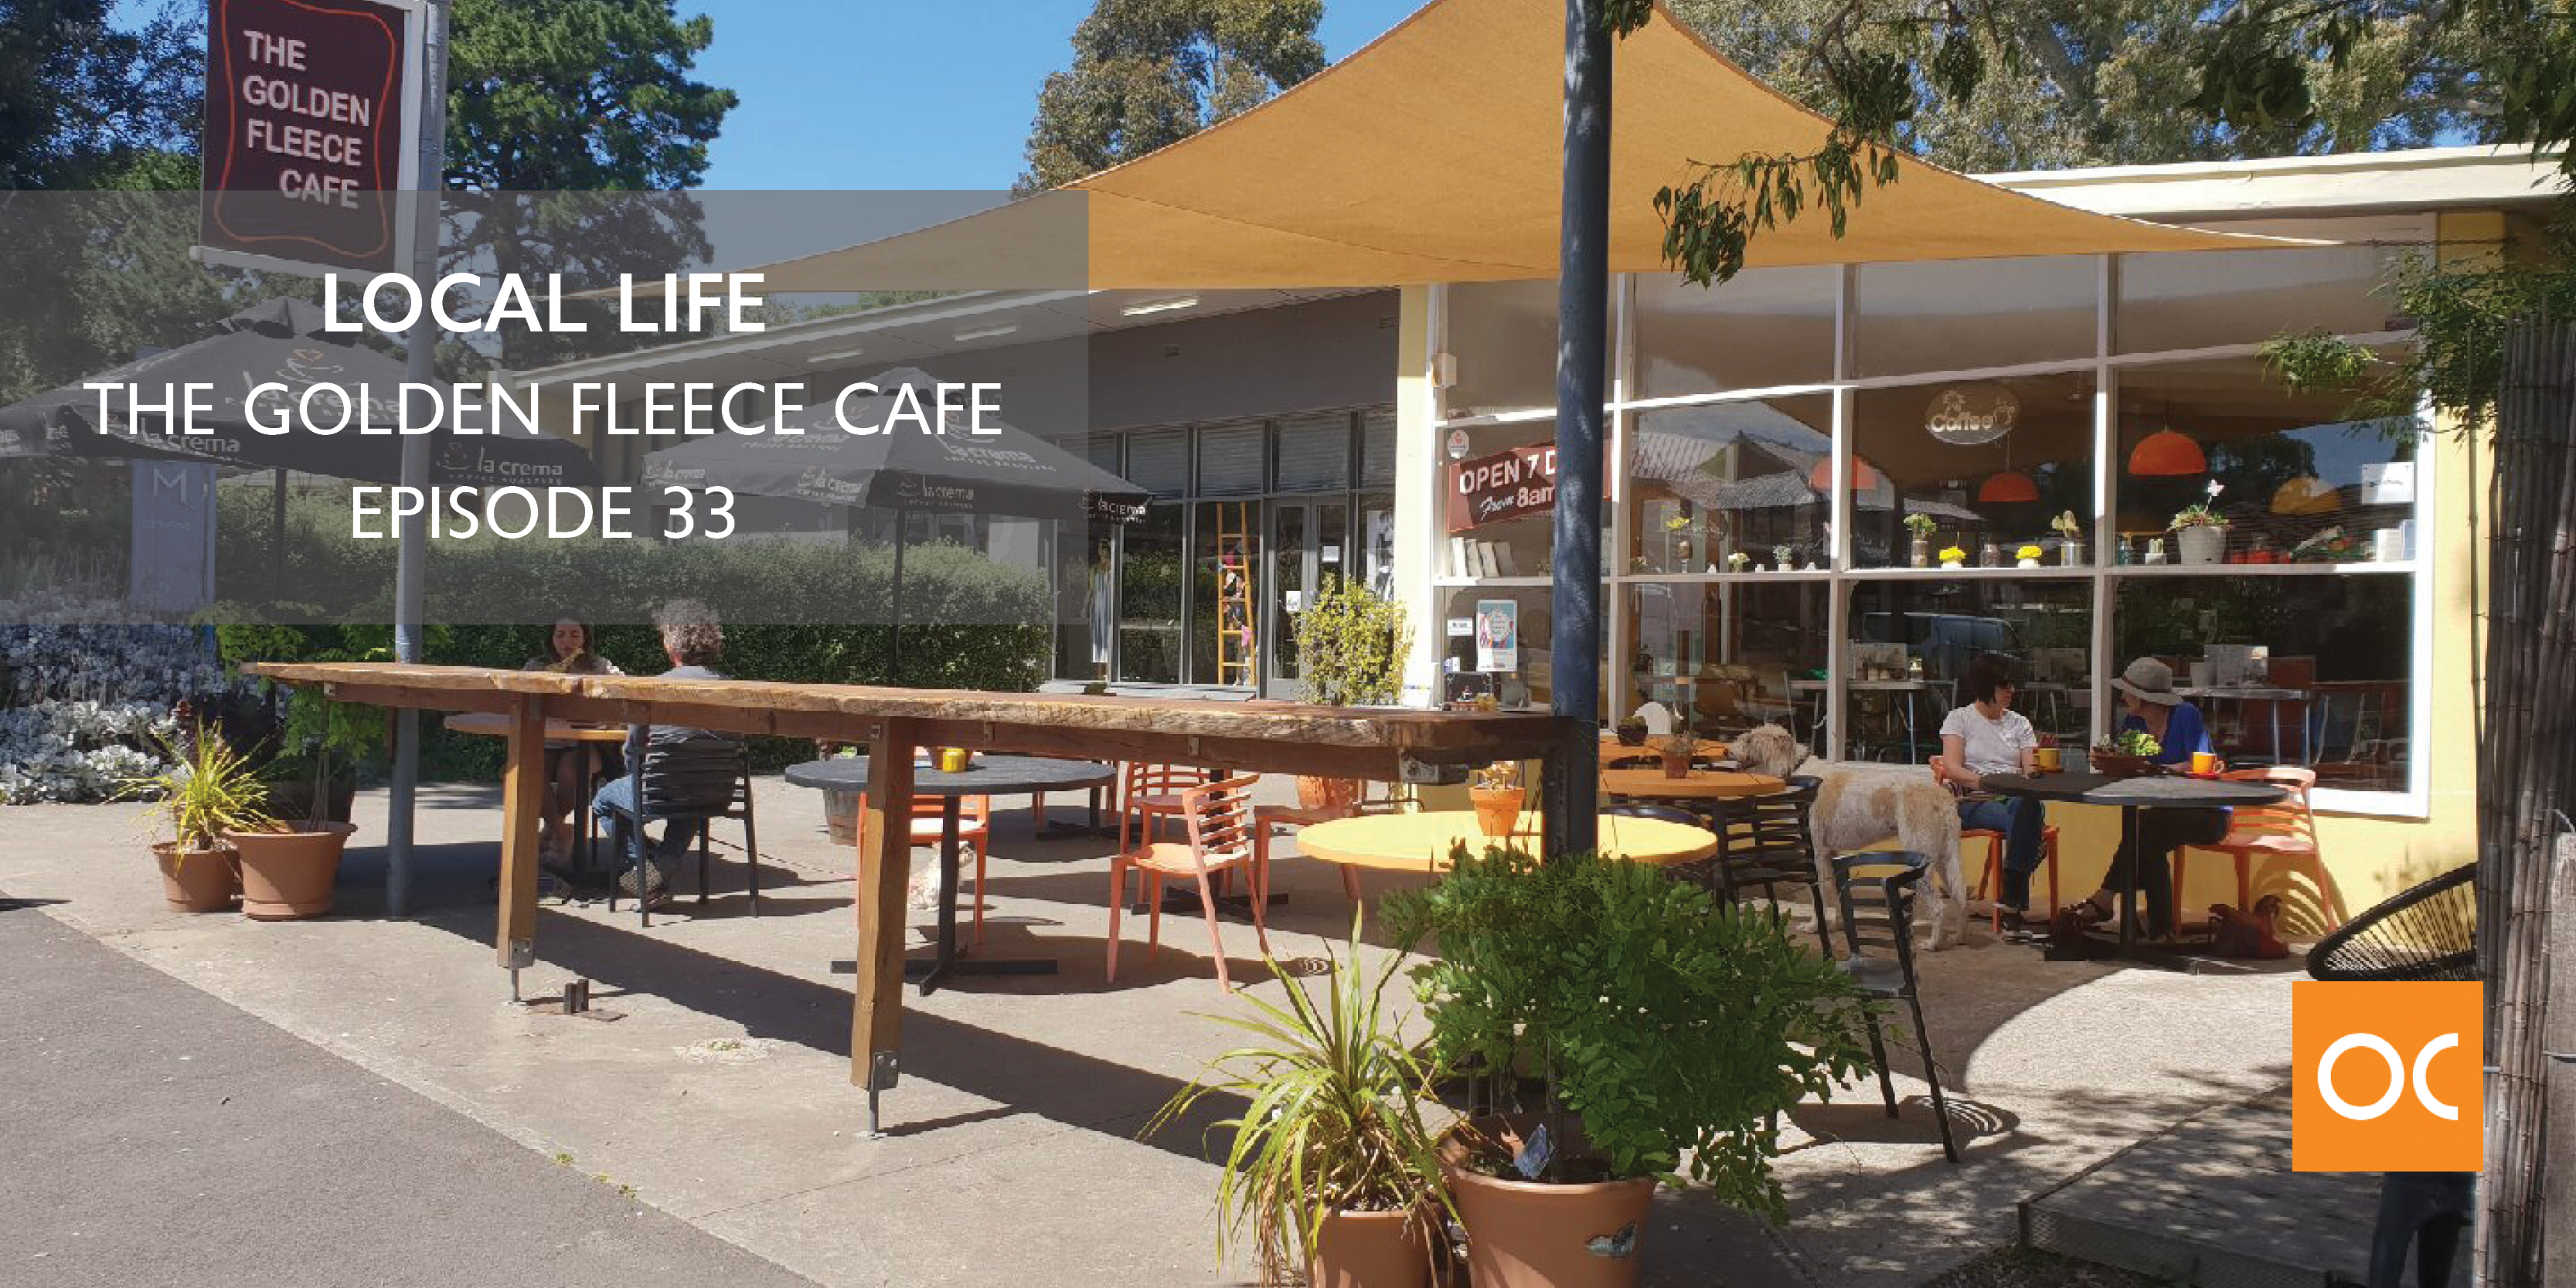 Local Life - Blog feature image The Golden Fleece cafe Ep 33